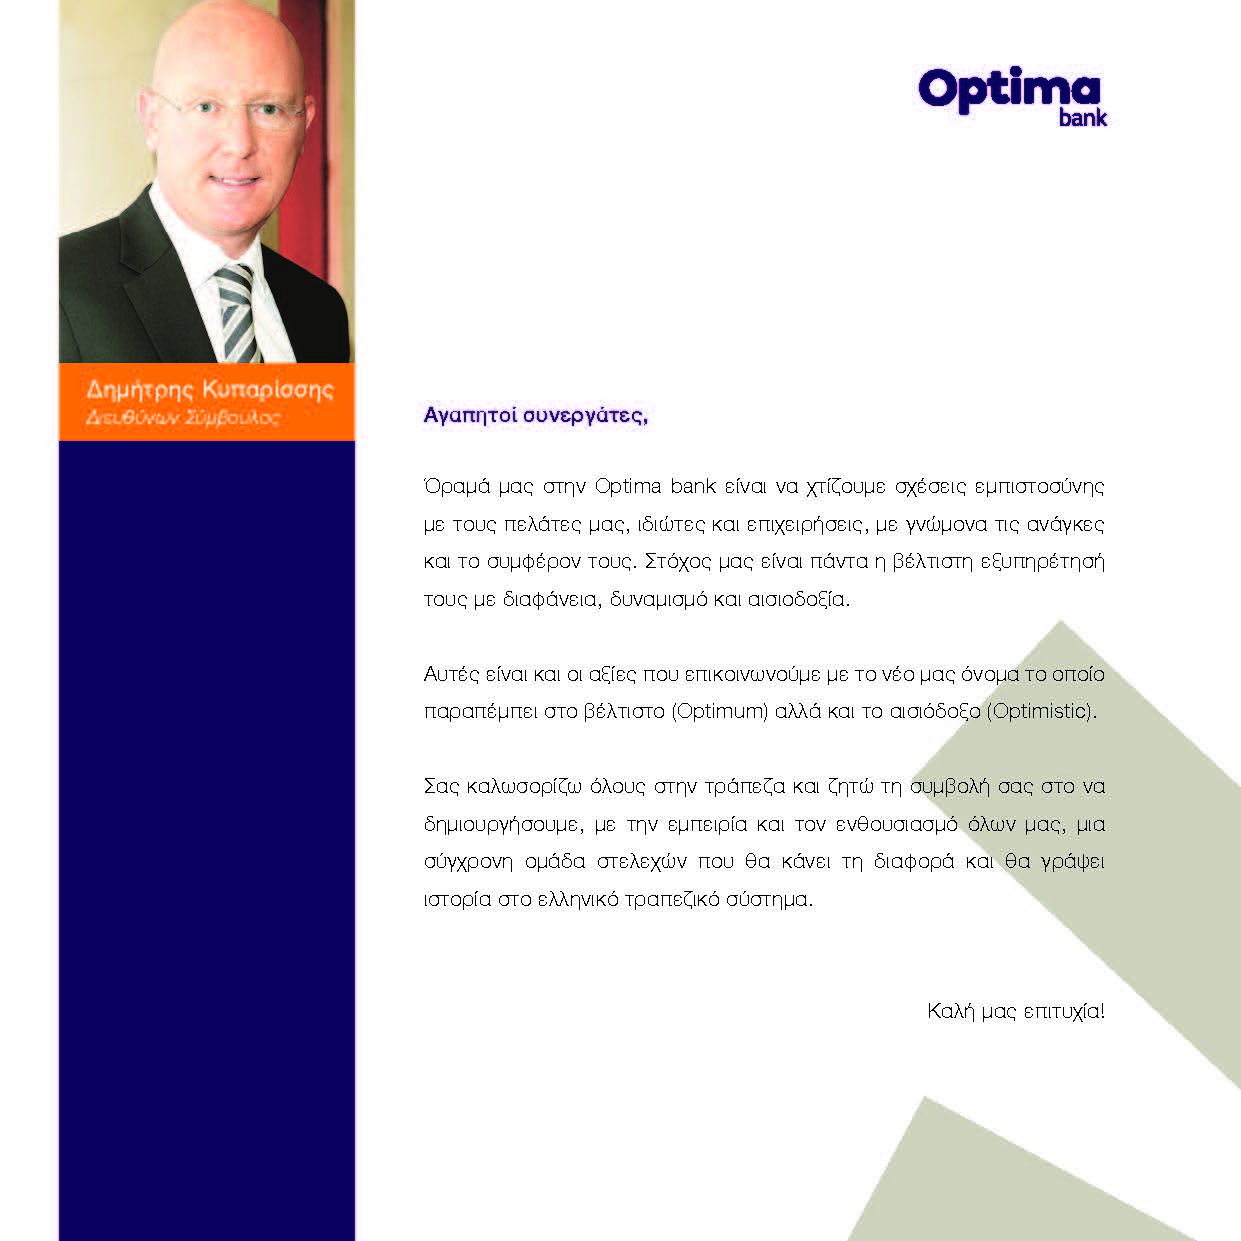 https://www.jib.gr/wp-content/uploads/2020/09/OPTIMA-BANK-BOOKLET-WEB_Page_003.jpg